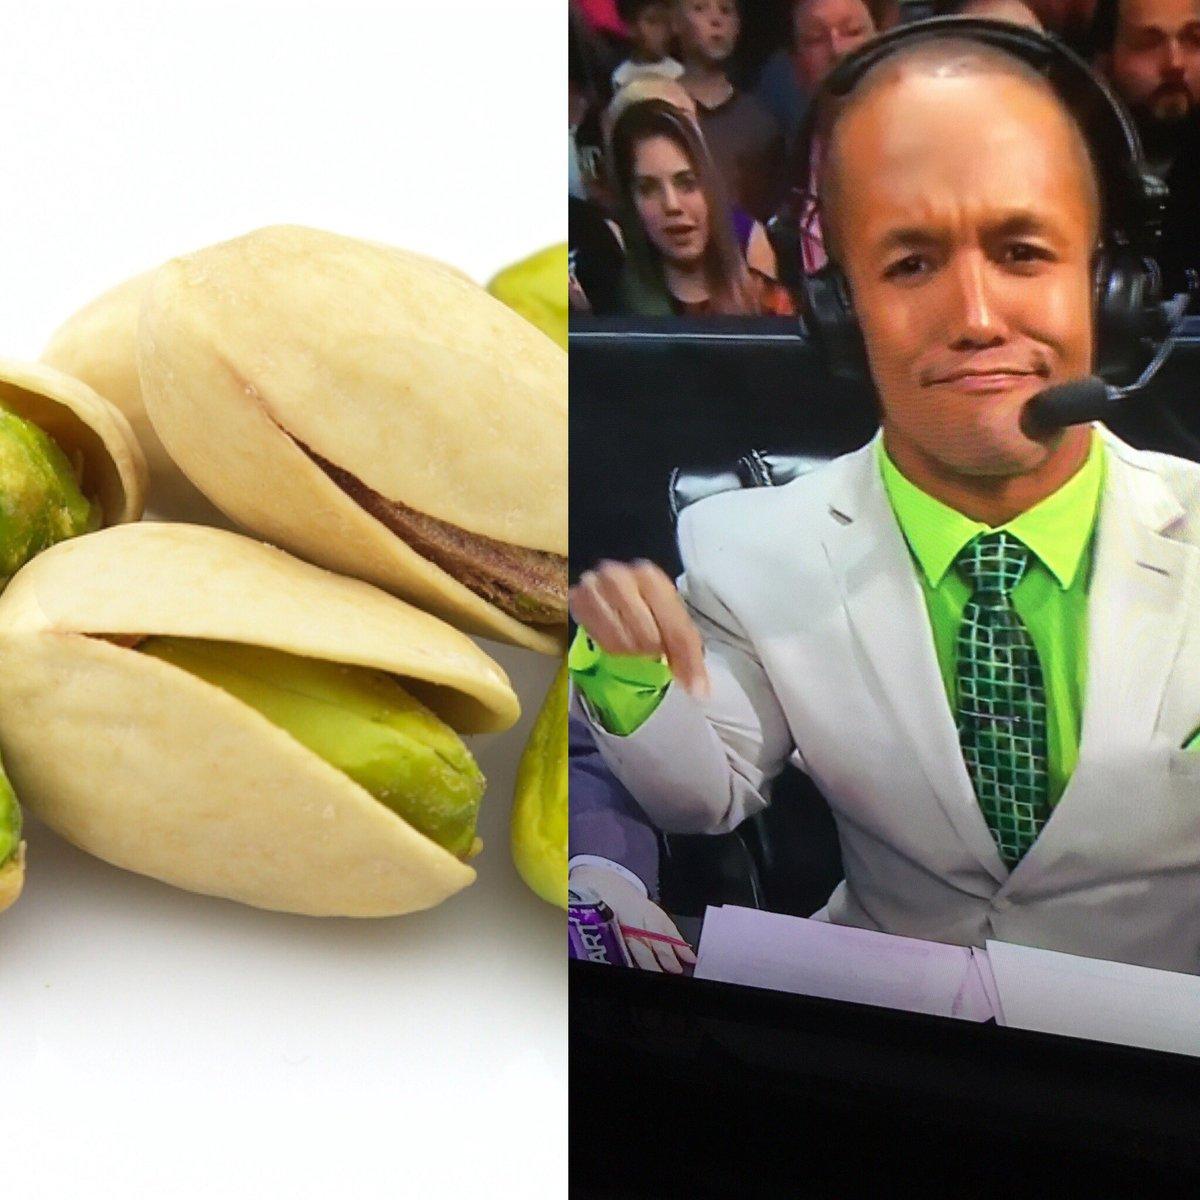 . @ByronSaxton is looking like a damn pistachio hahah https://t.co/hqlX6Fb6Hv